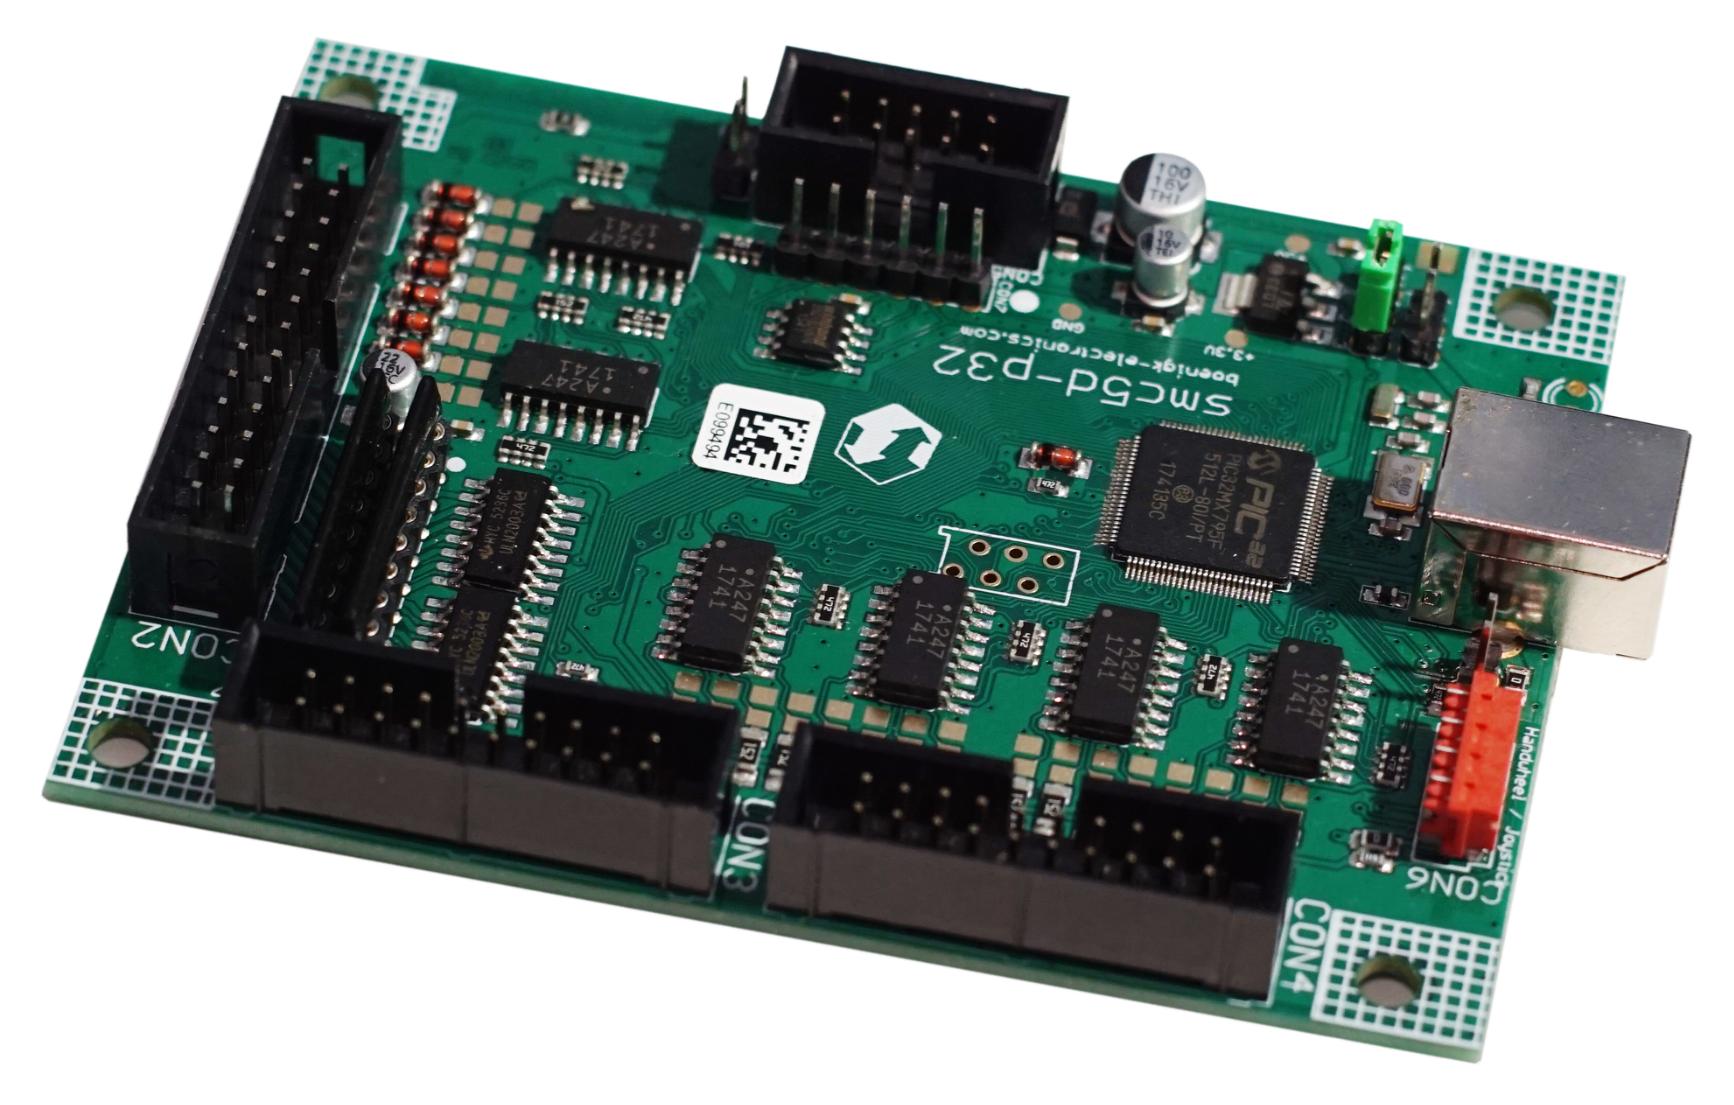 CNC Controller SMC5d-P32 Lite für Boenigk CNC-Graf